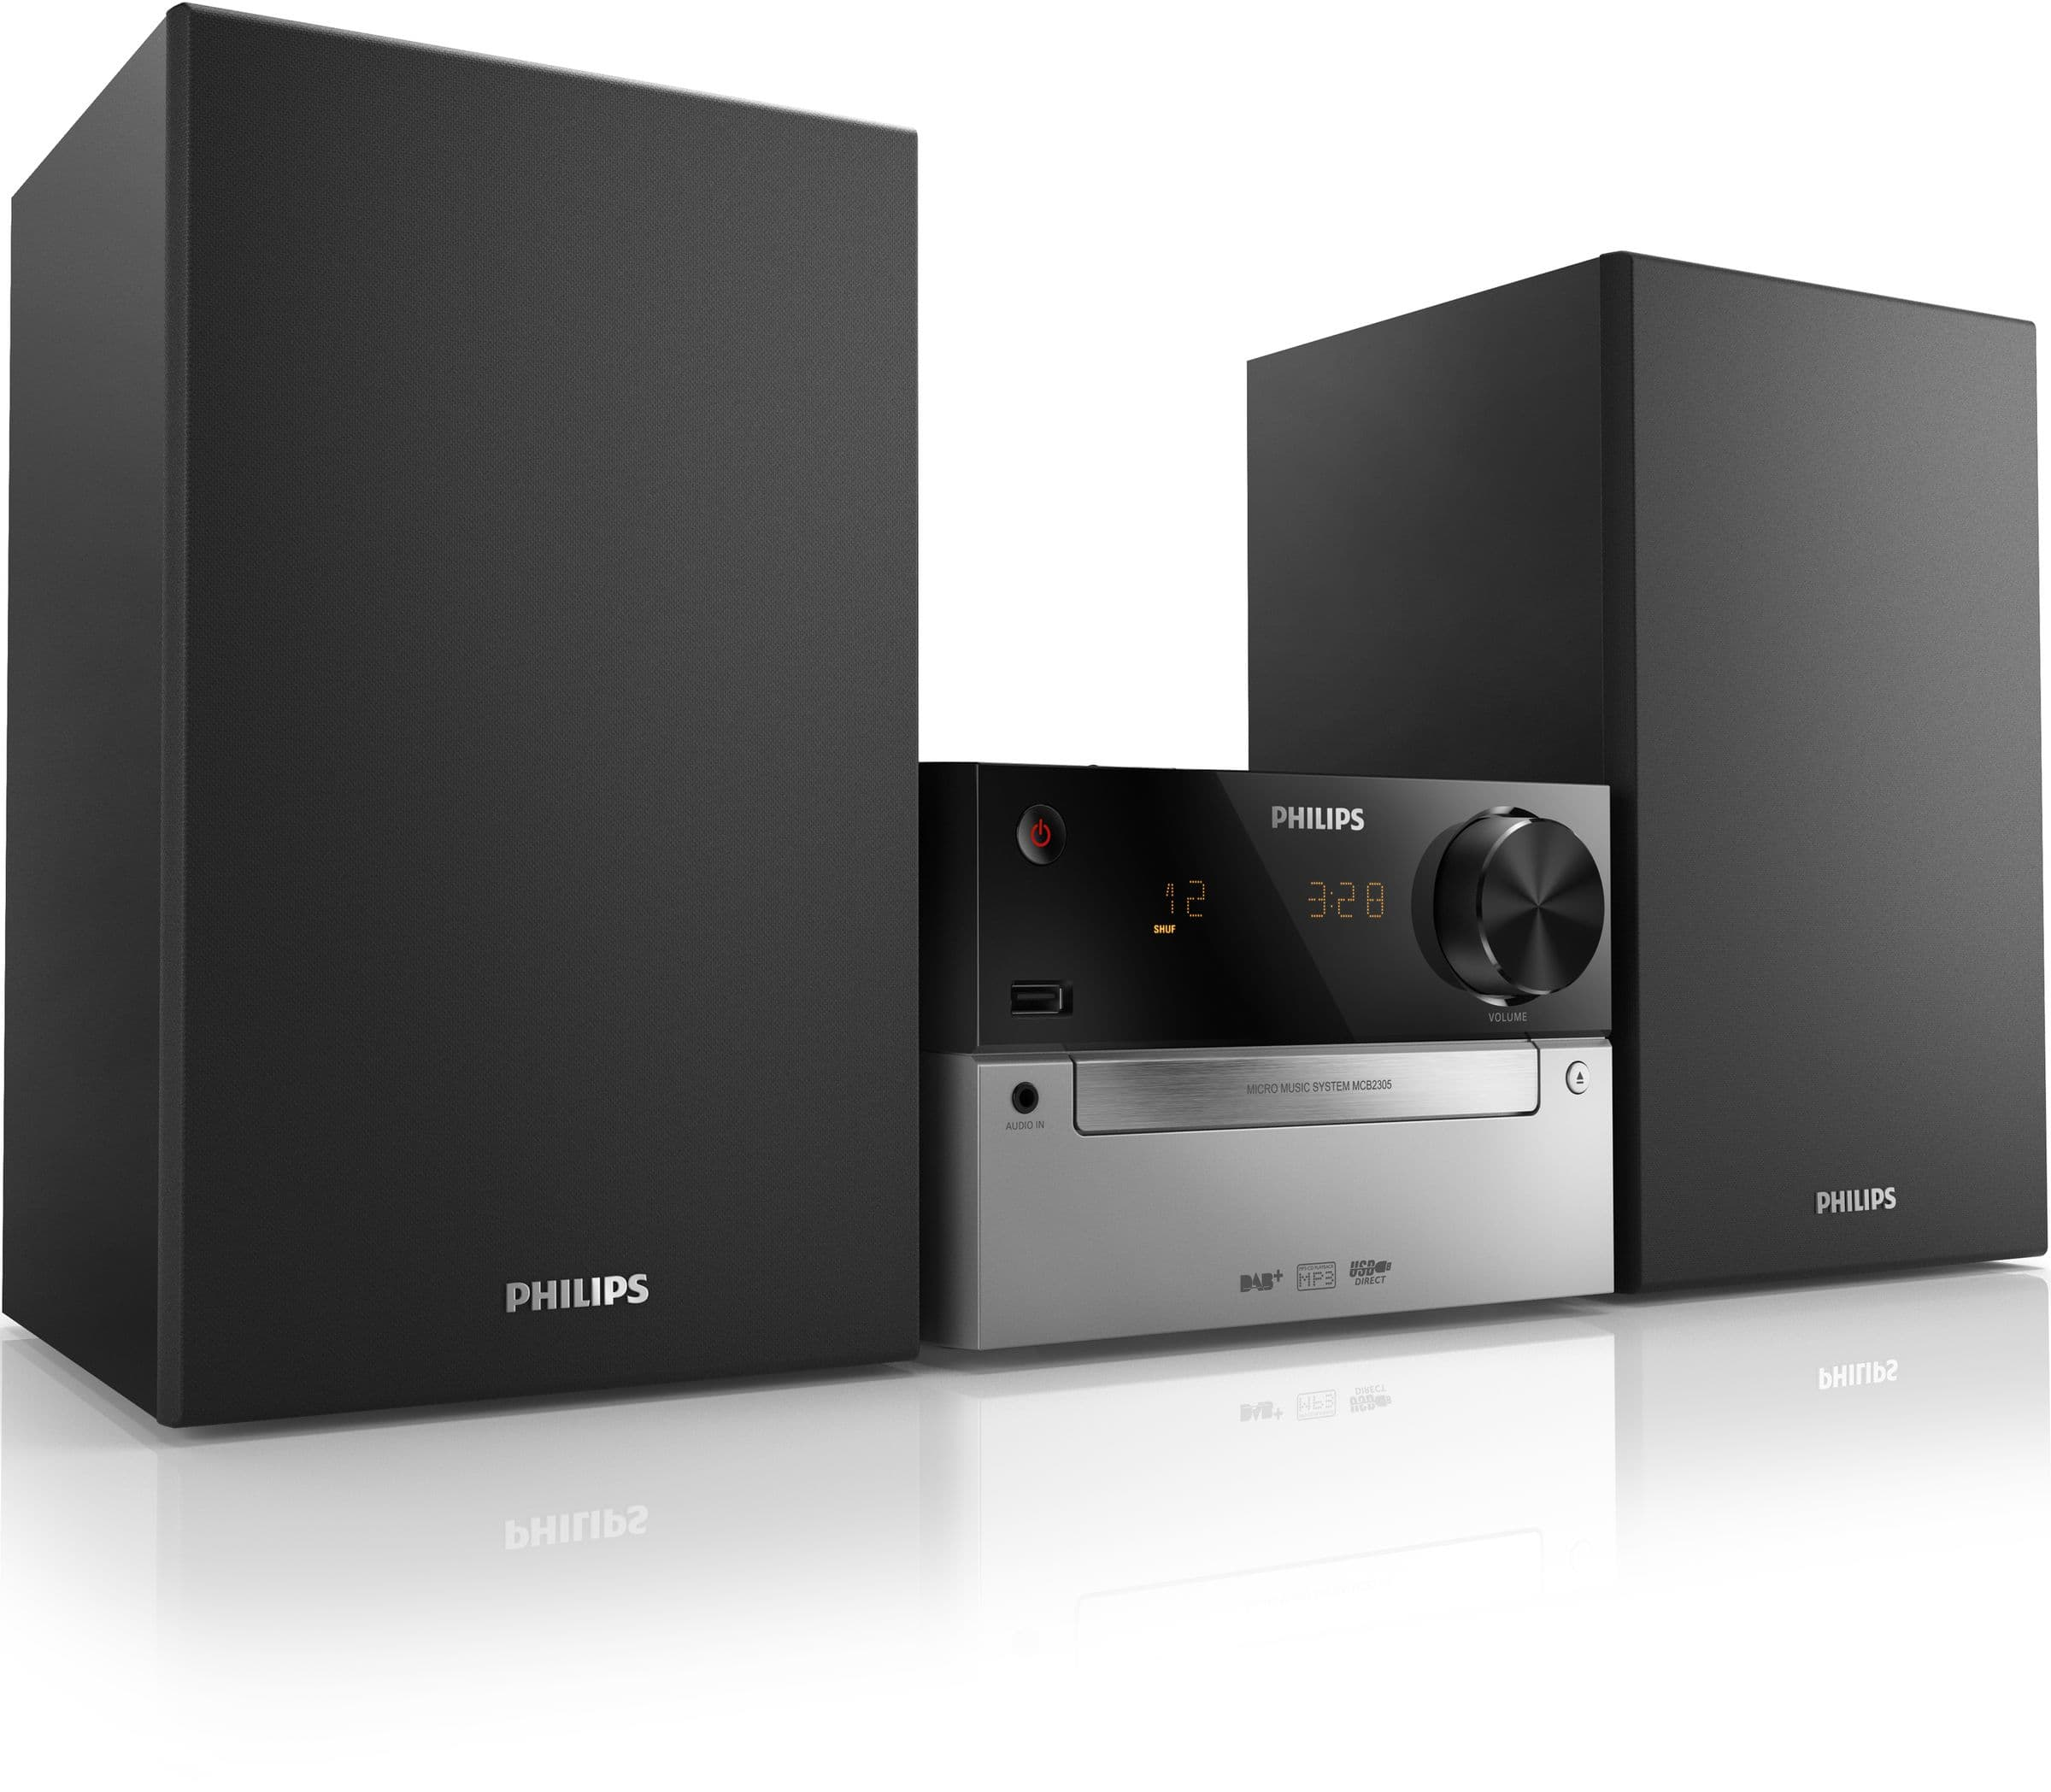 Philips MCB2305 Kompaktanlage CD CD-R/RW MP3-CD USB FM für 119,99 Euro